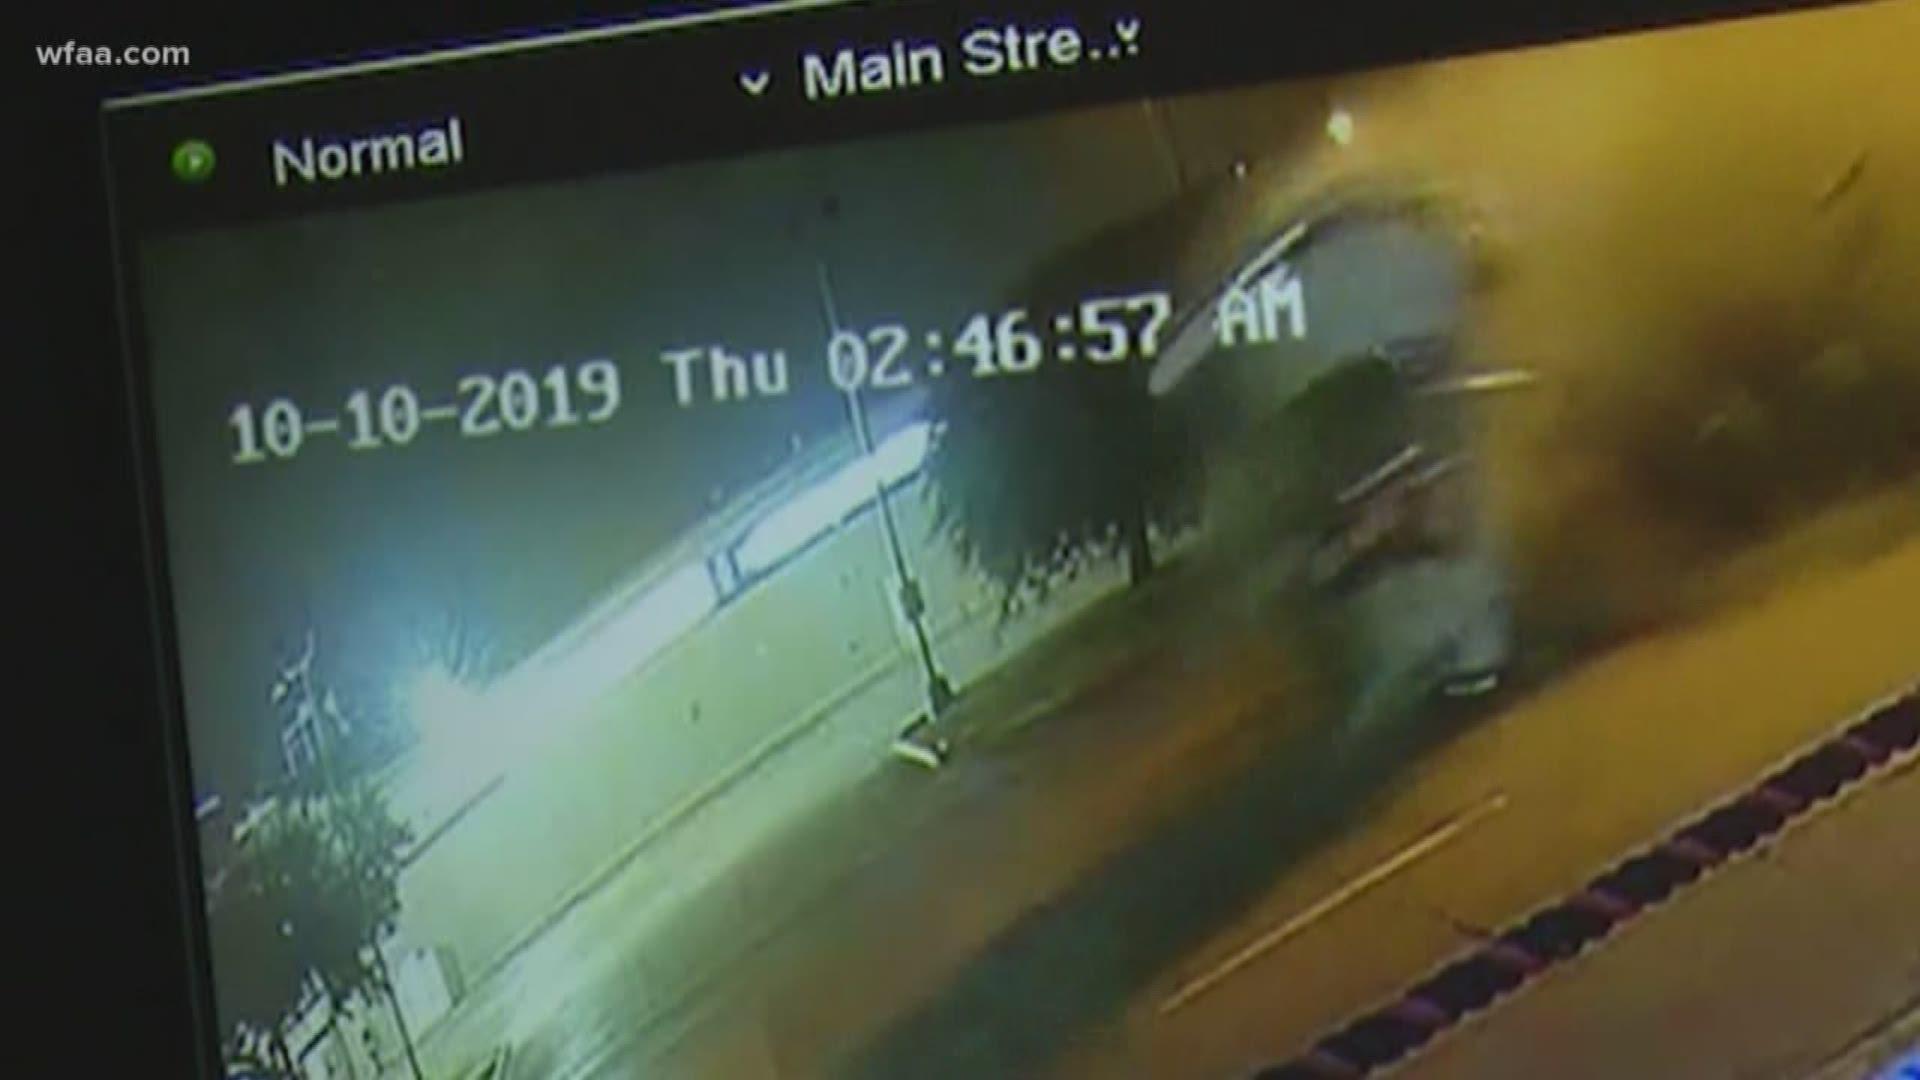 Boxer Errol Spence S Ferrari Flips Multiple Times In Dallas Crash Wfaa Com